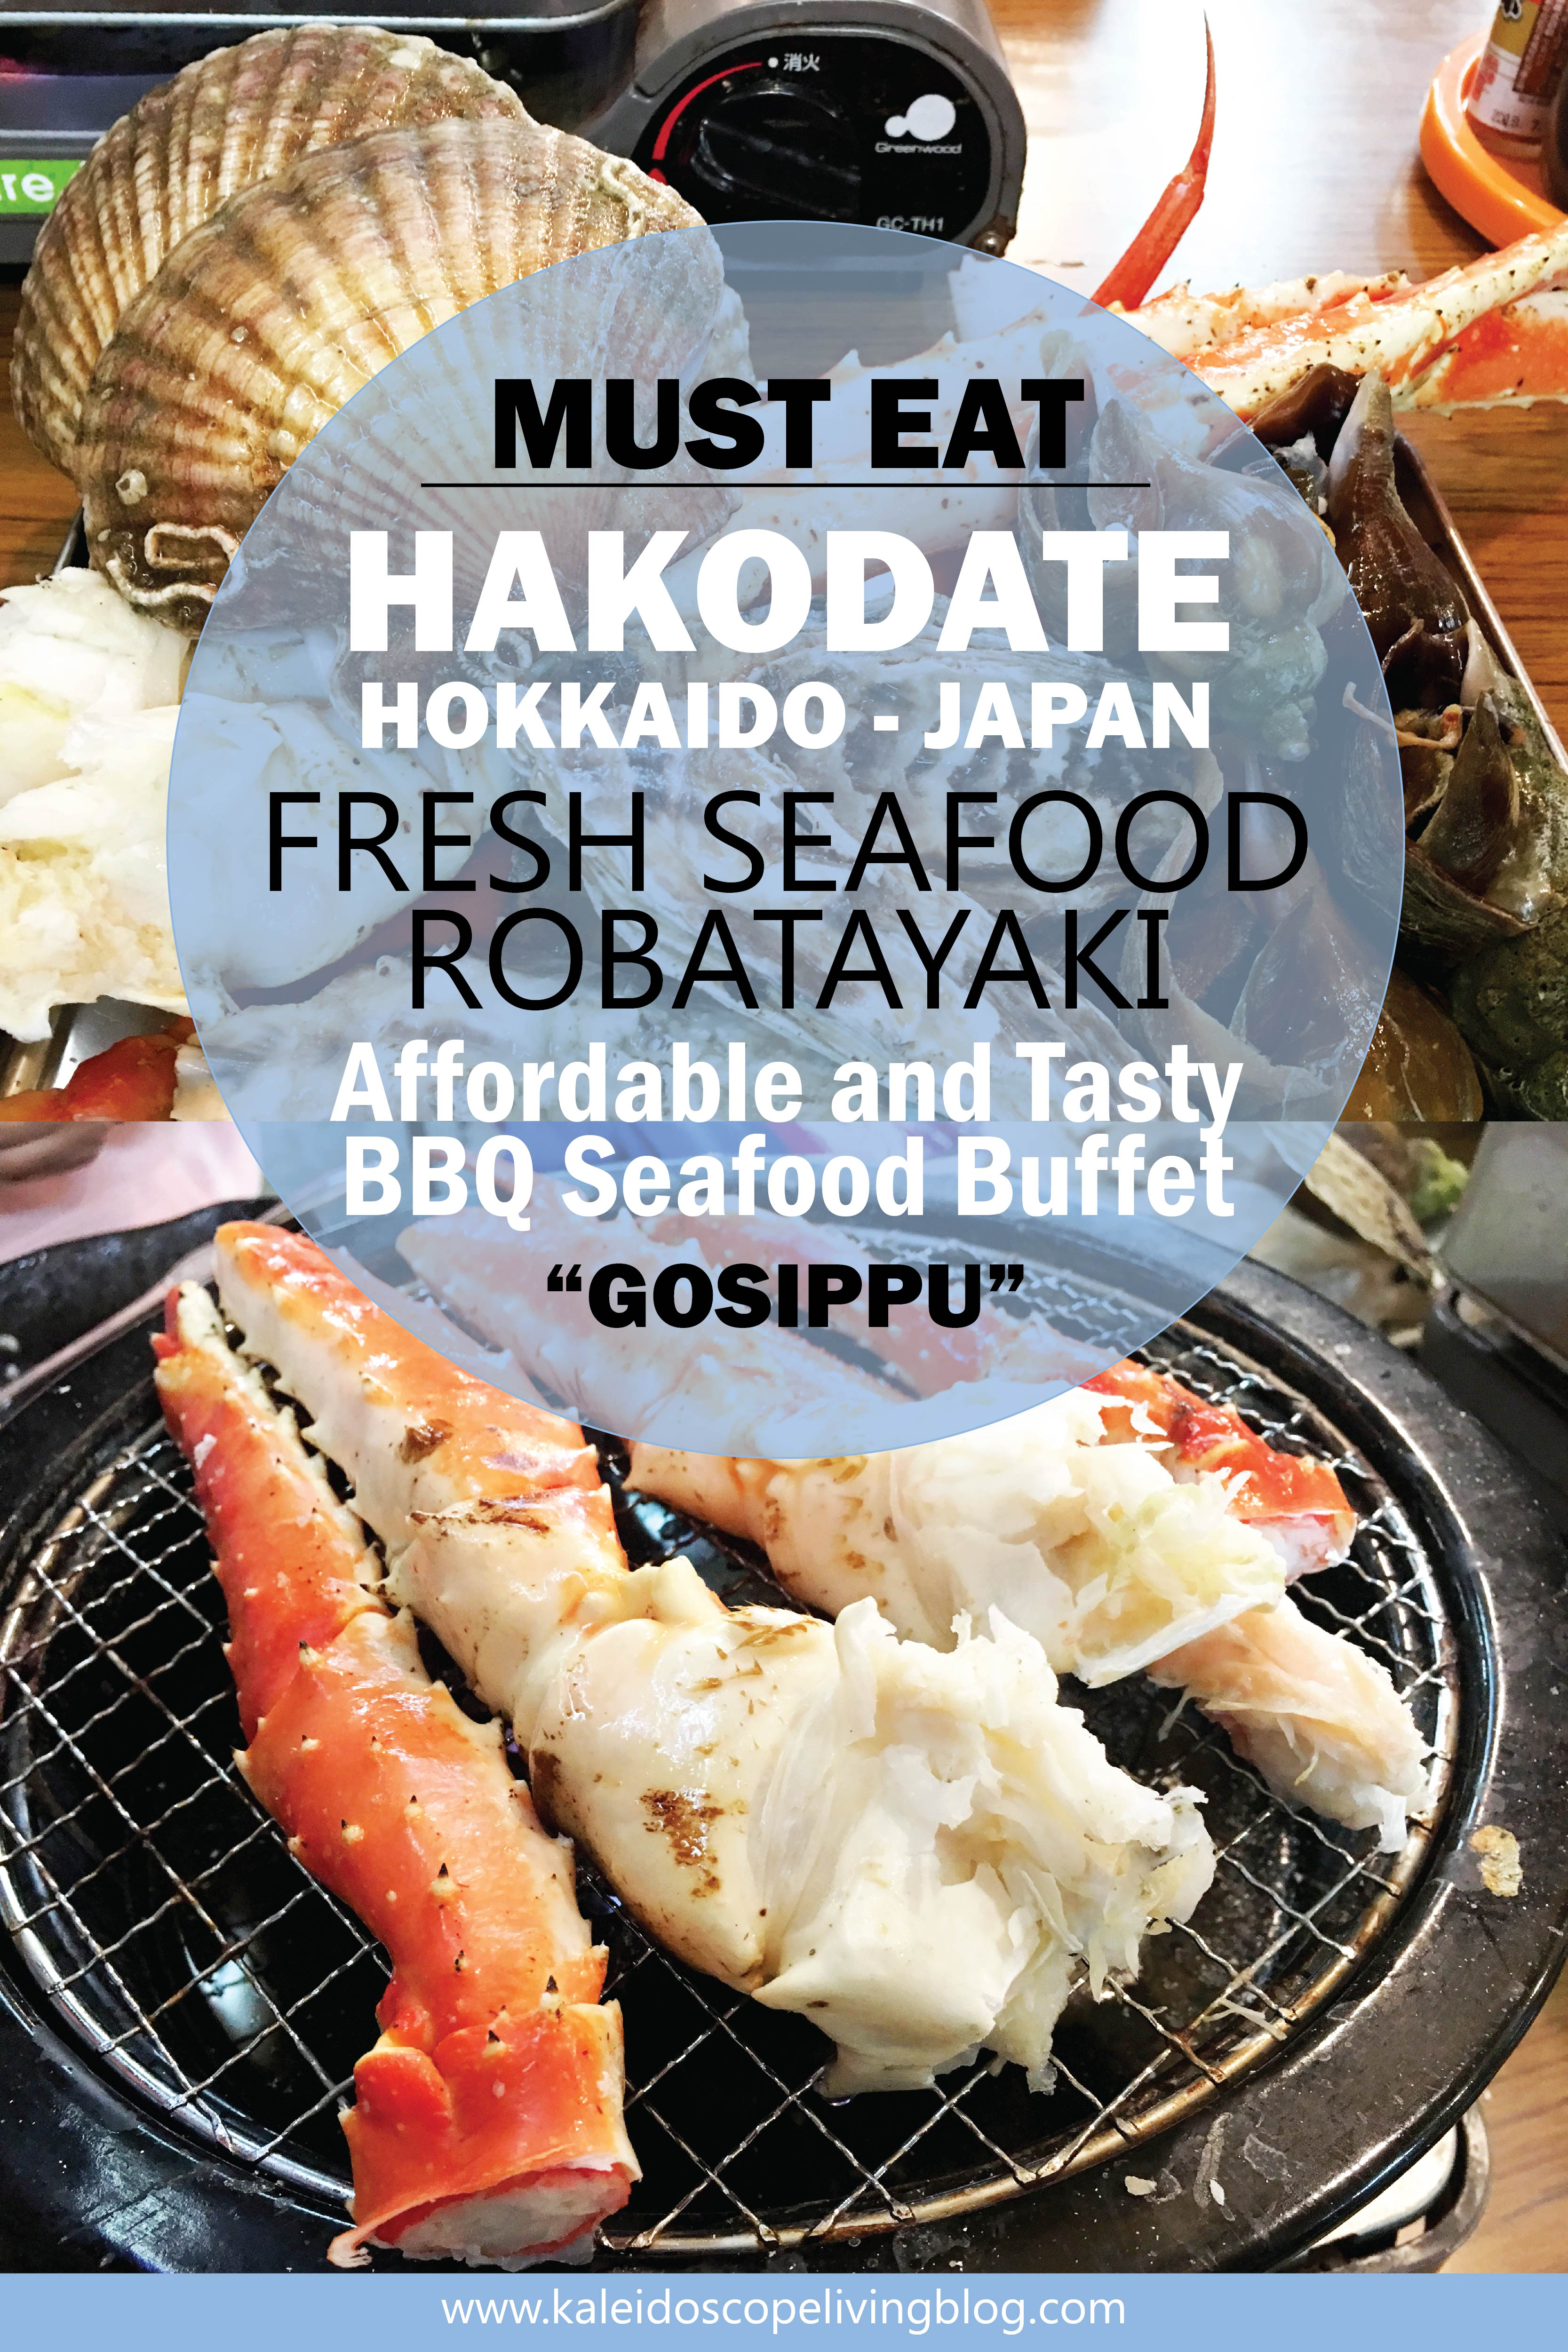 Travel_Japan_Hokkaido_Hakodate_Market_Gojippu_Local_Seafood_Robatayaki_五聚富_函館_MAP